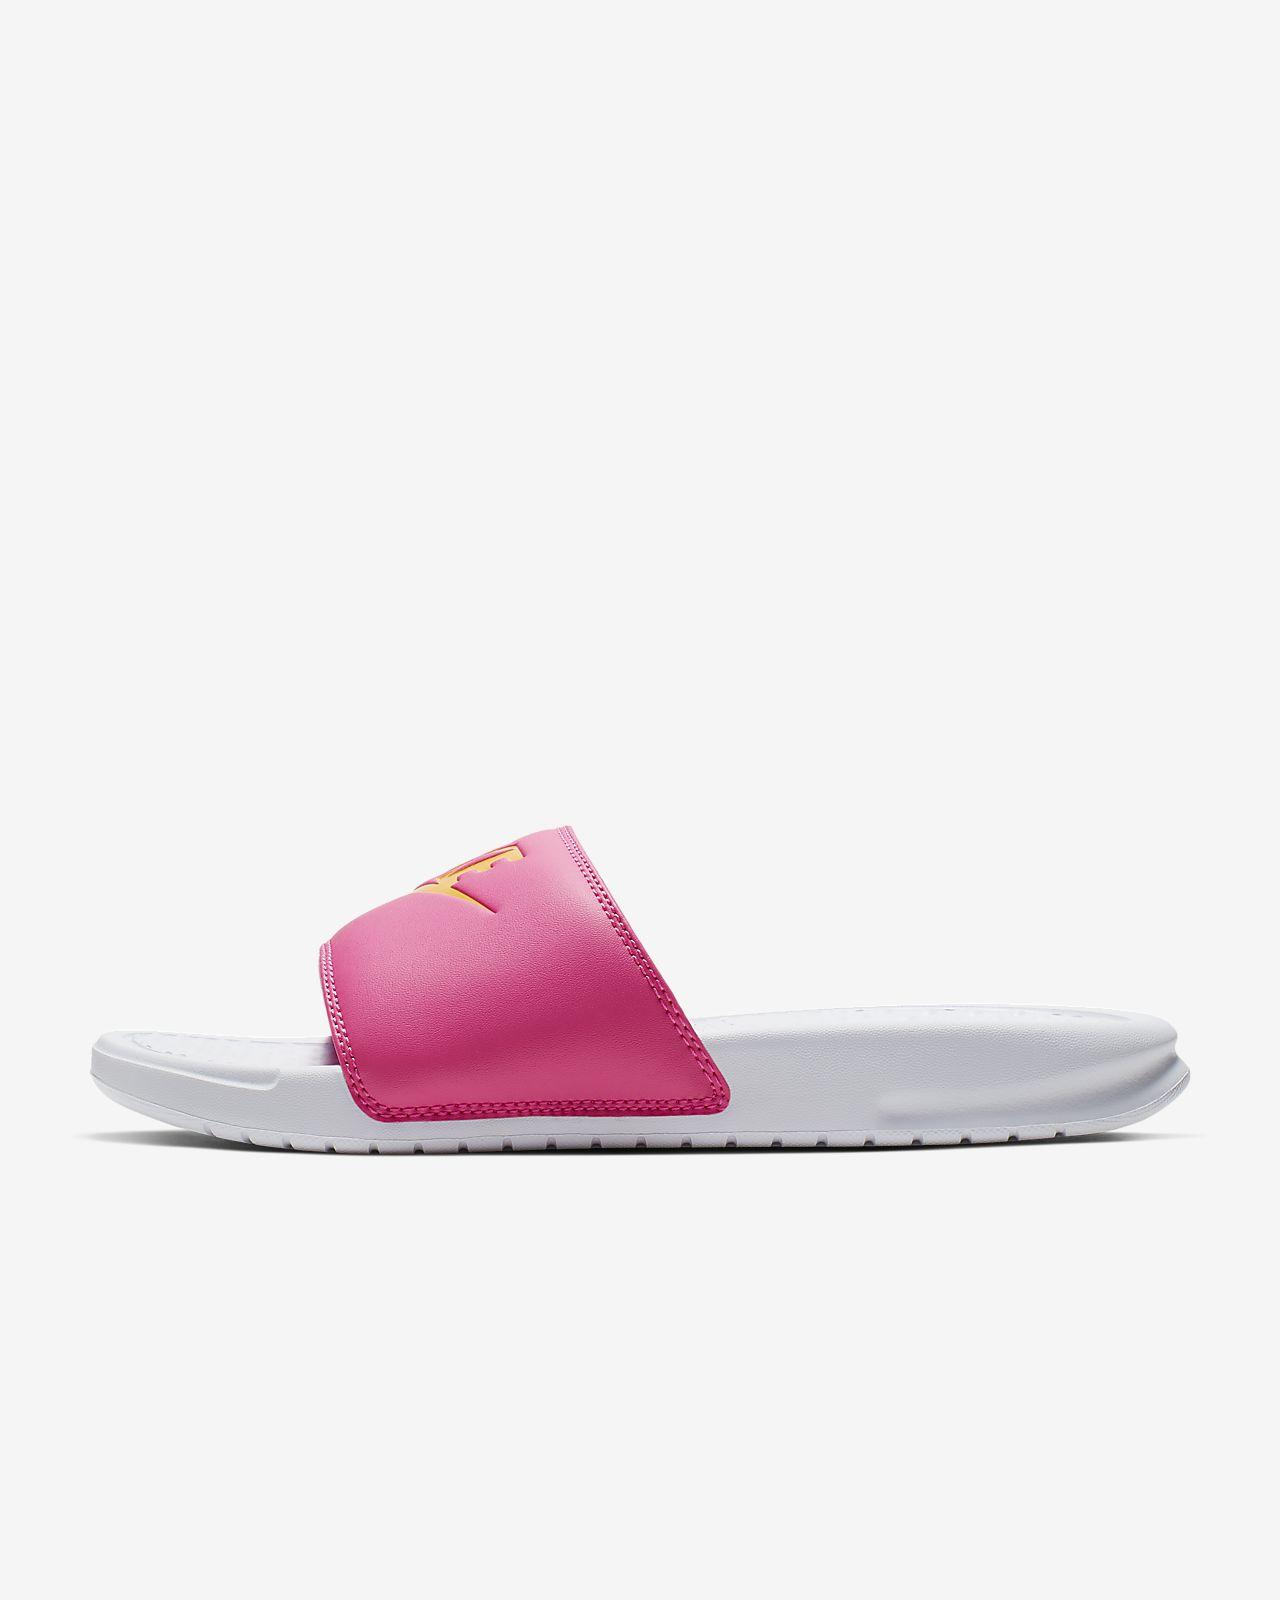 huge discount fead9 c97c7 Low Resolution Nike Benassi Women s Slide Nike Benassi Women s Slide